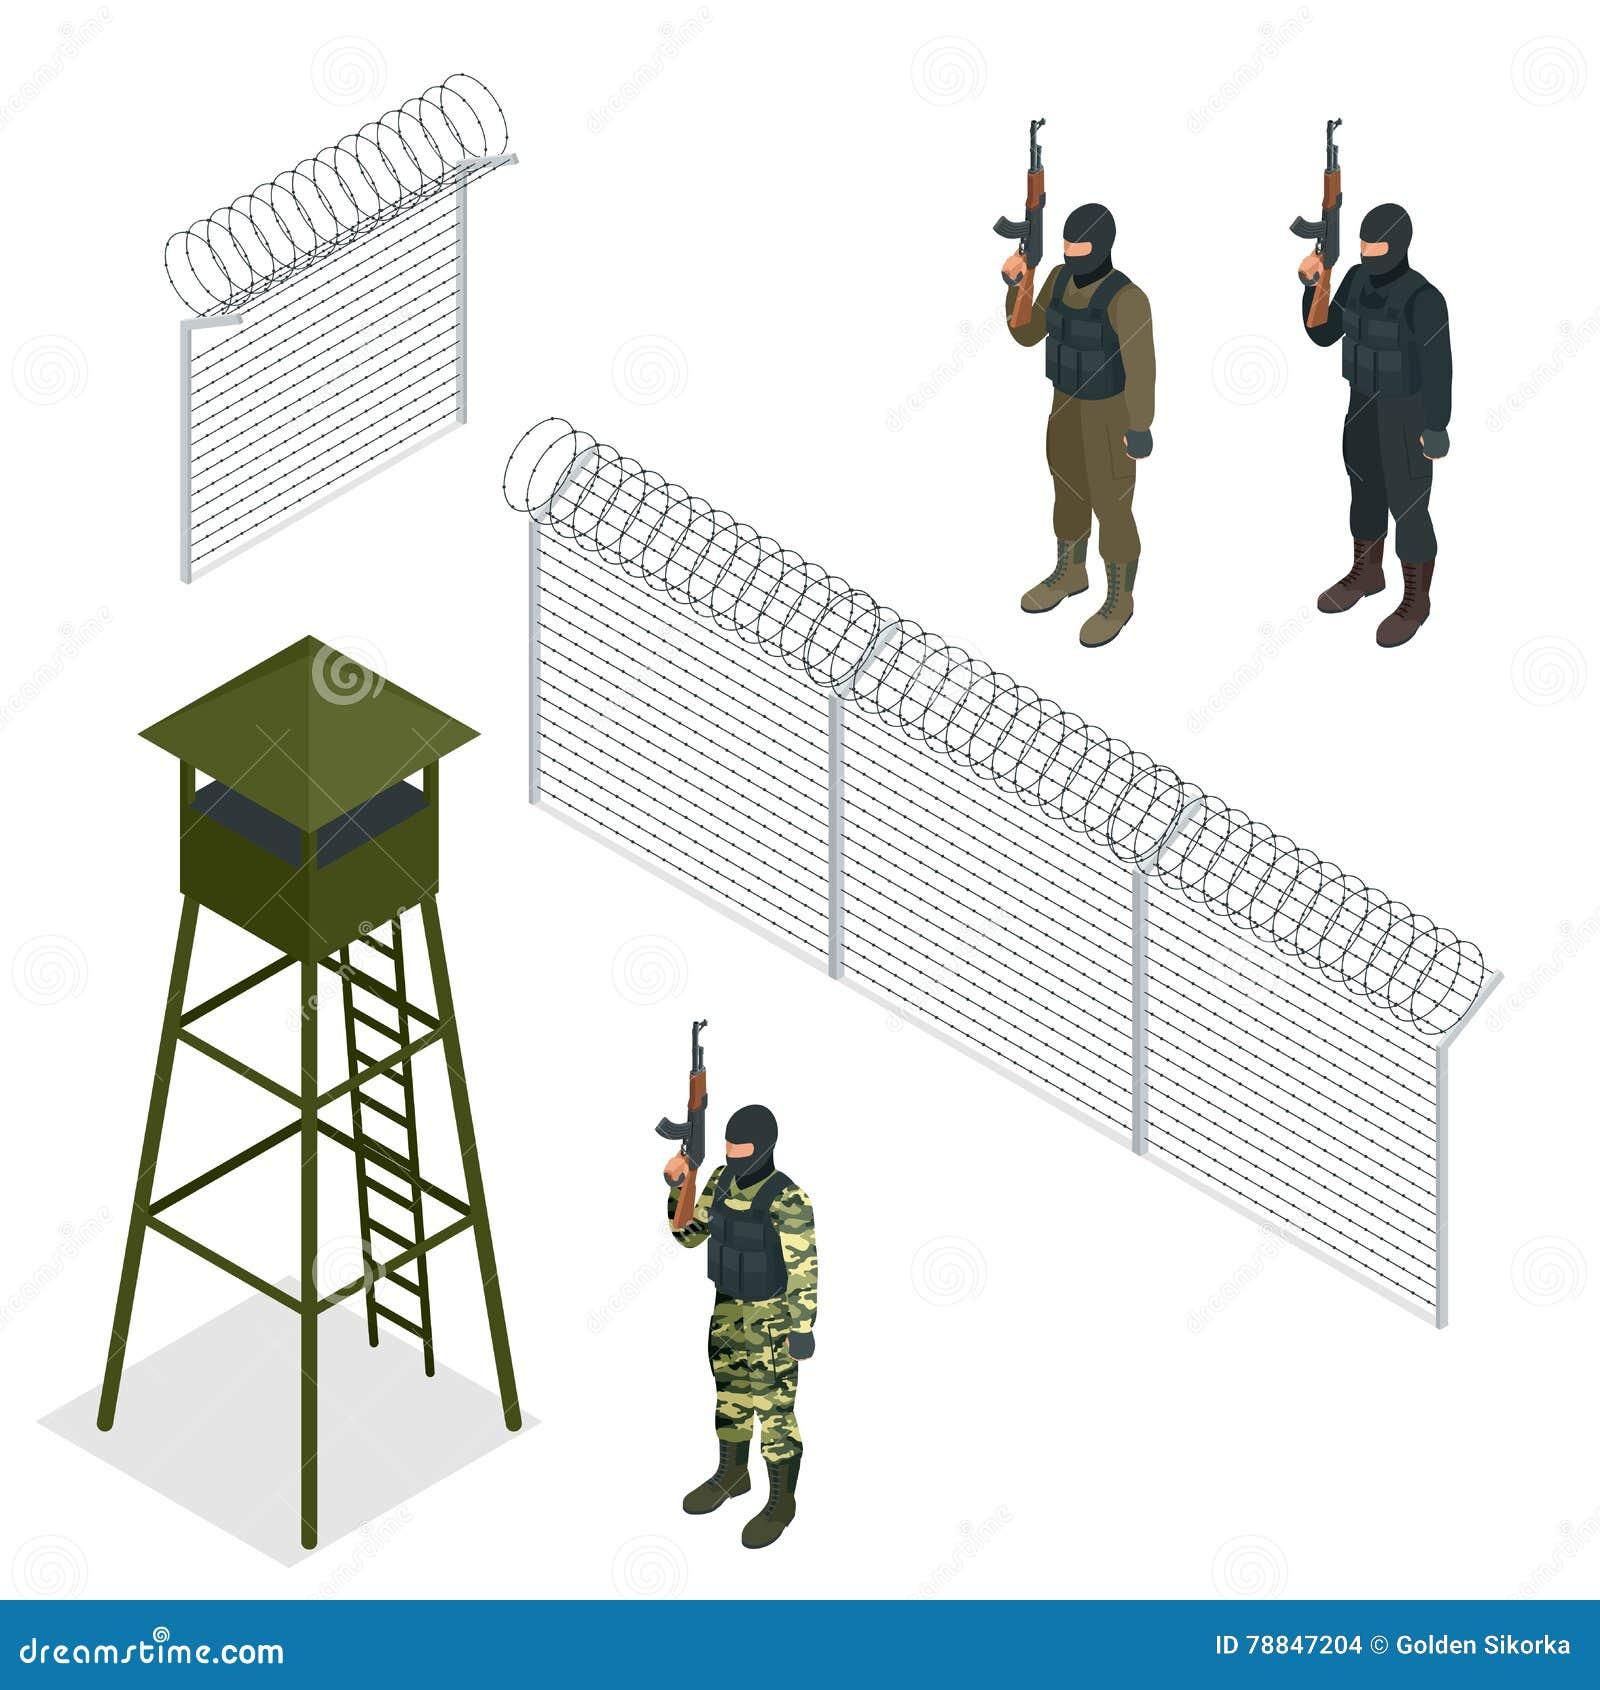 Charmant Stacheldrahtzaun Cartoon Ideen - Der Schaltplan ...